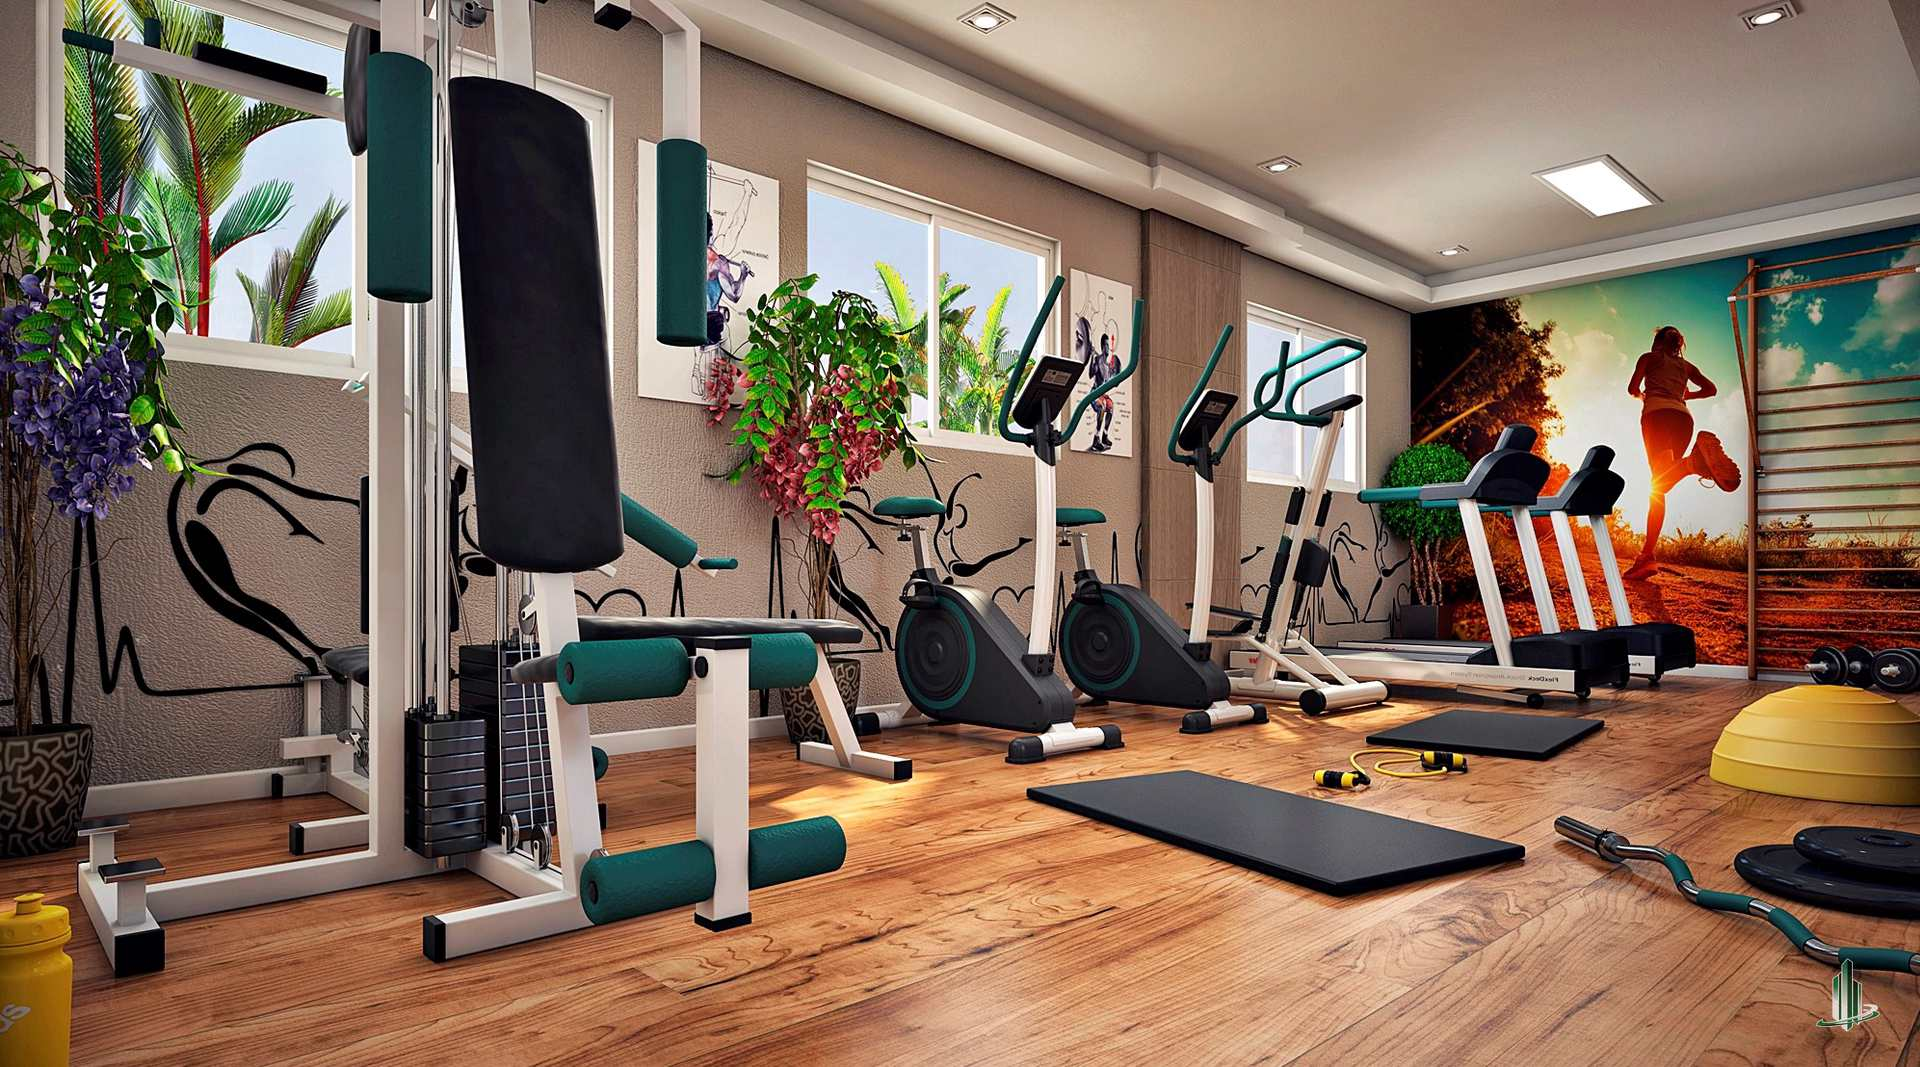 anita_malfati_fitness_Alta-editado-